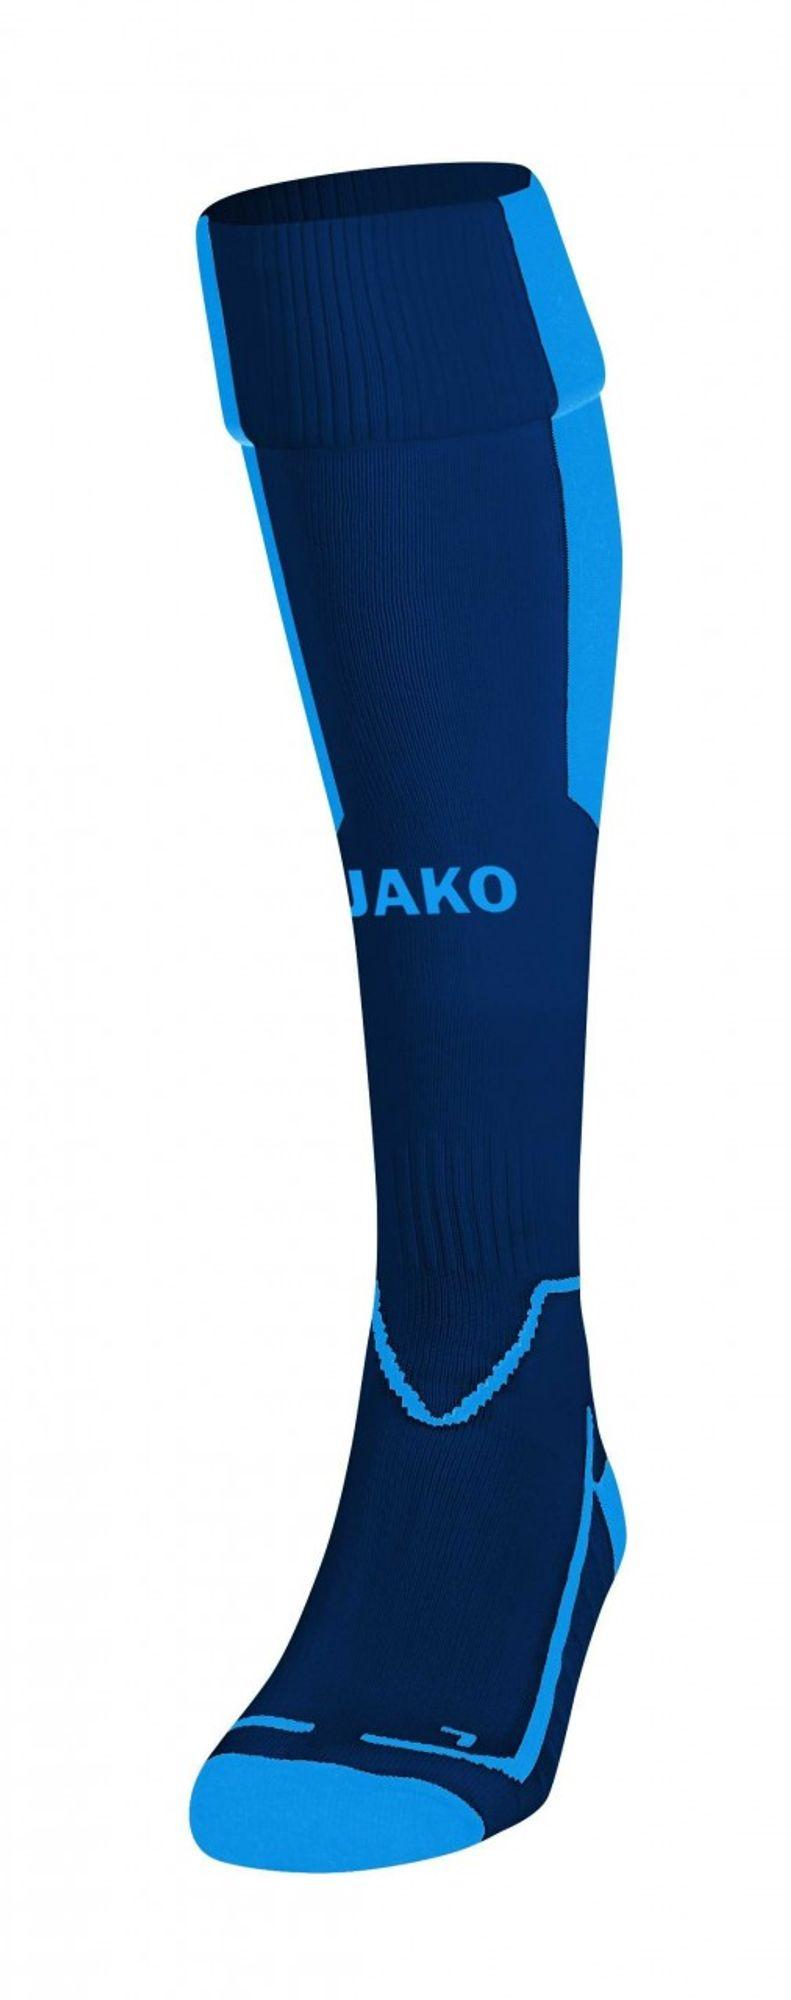 Jako Stutzenstrumpf Lazio - marine/JAKO blau